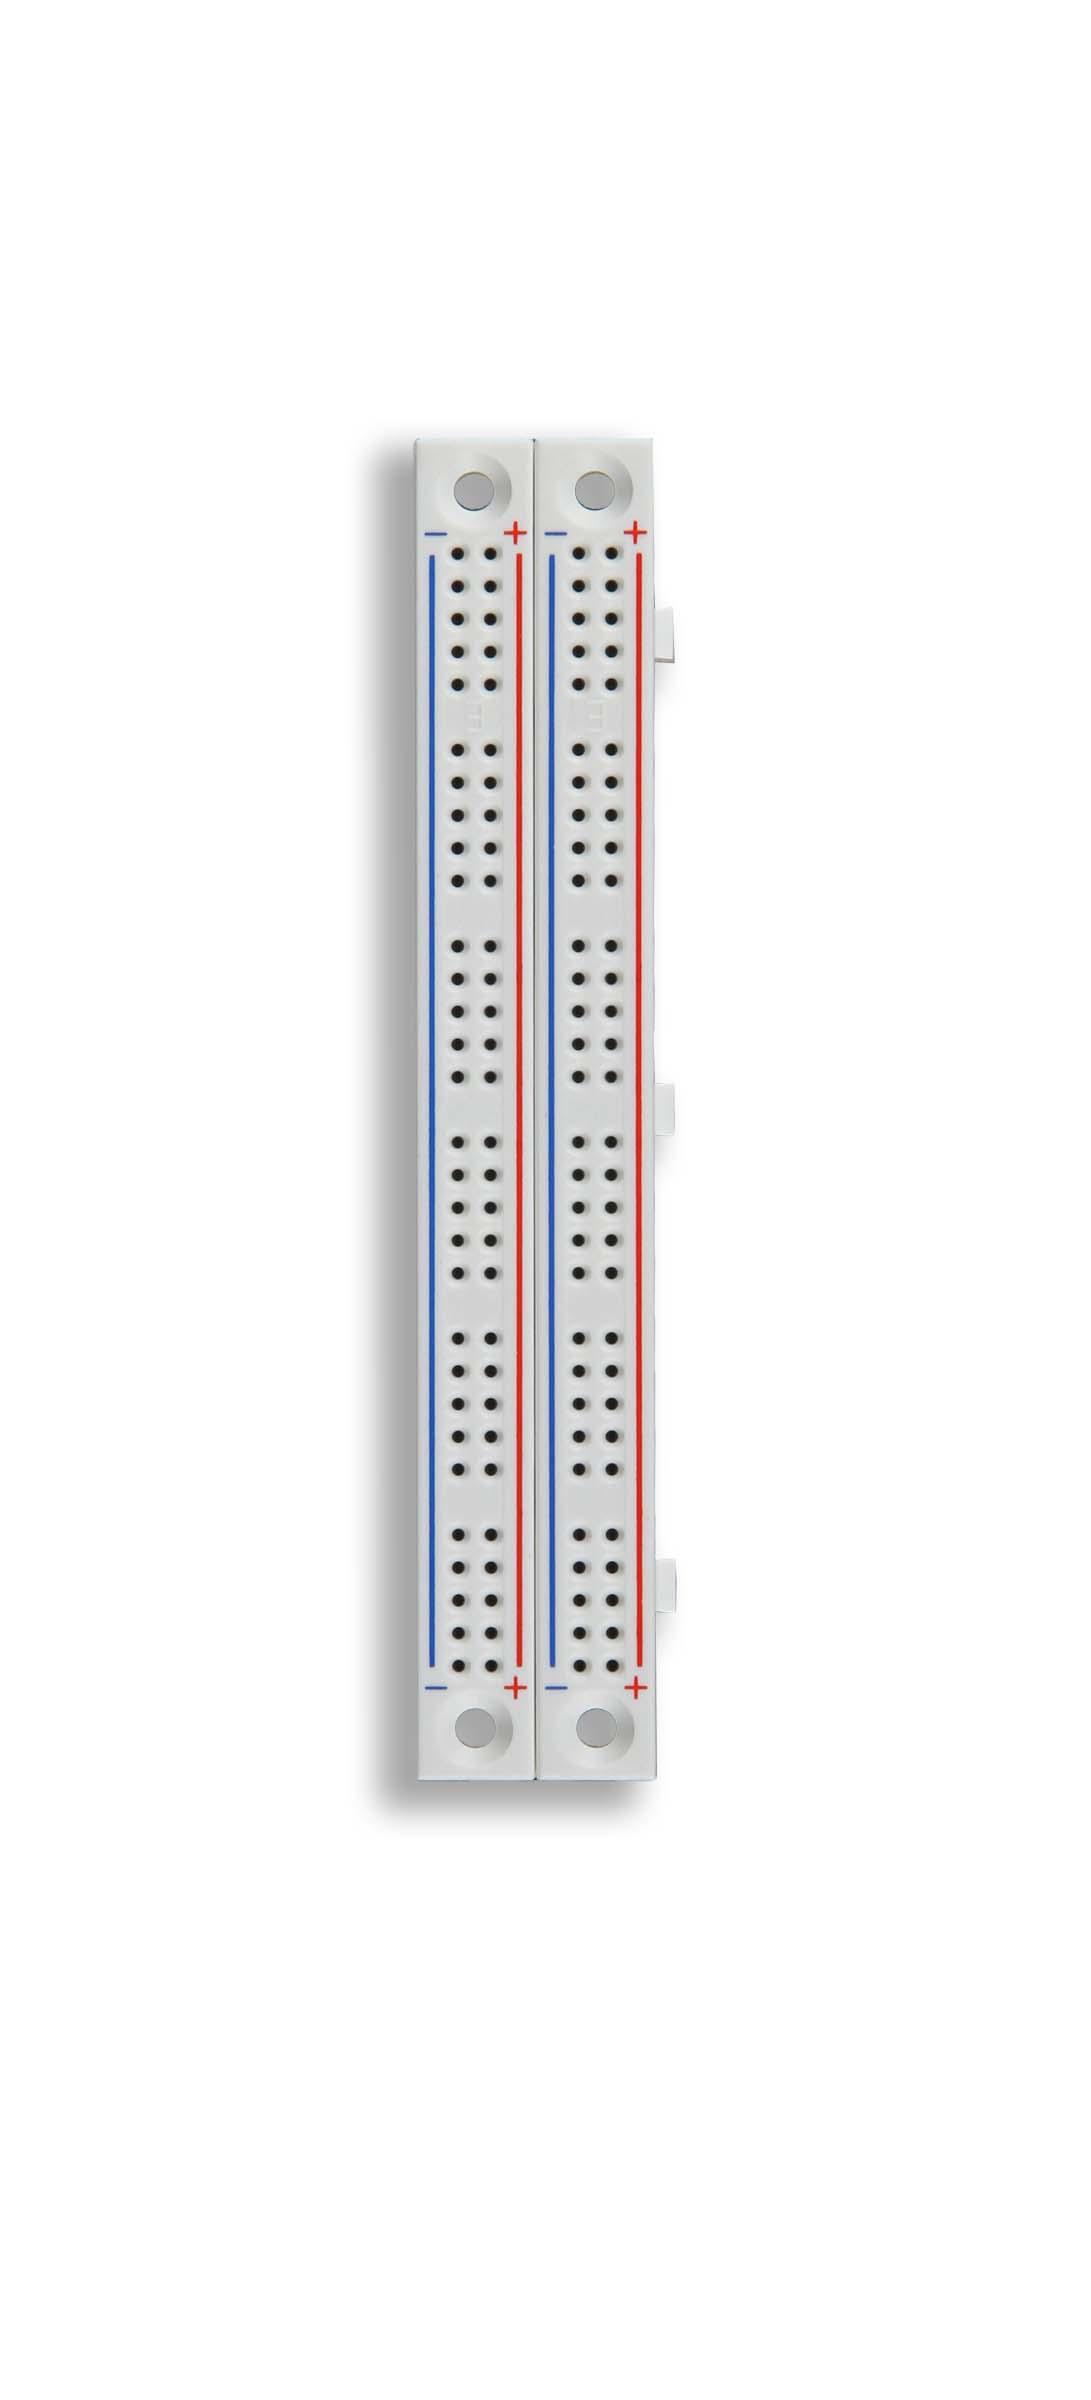 Global Specialties GS-060 Bus Strip, 60 Tie-Points, 2-Pack